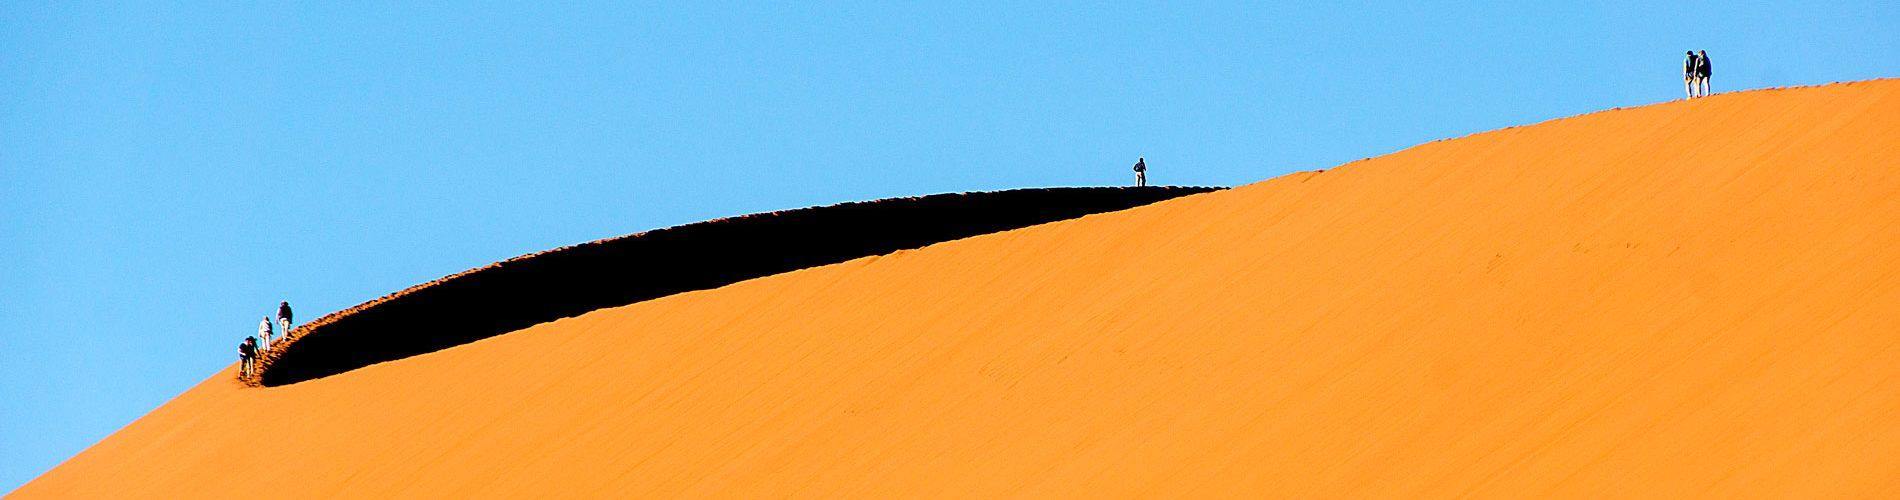 Namibia-Header-1